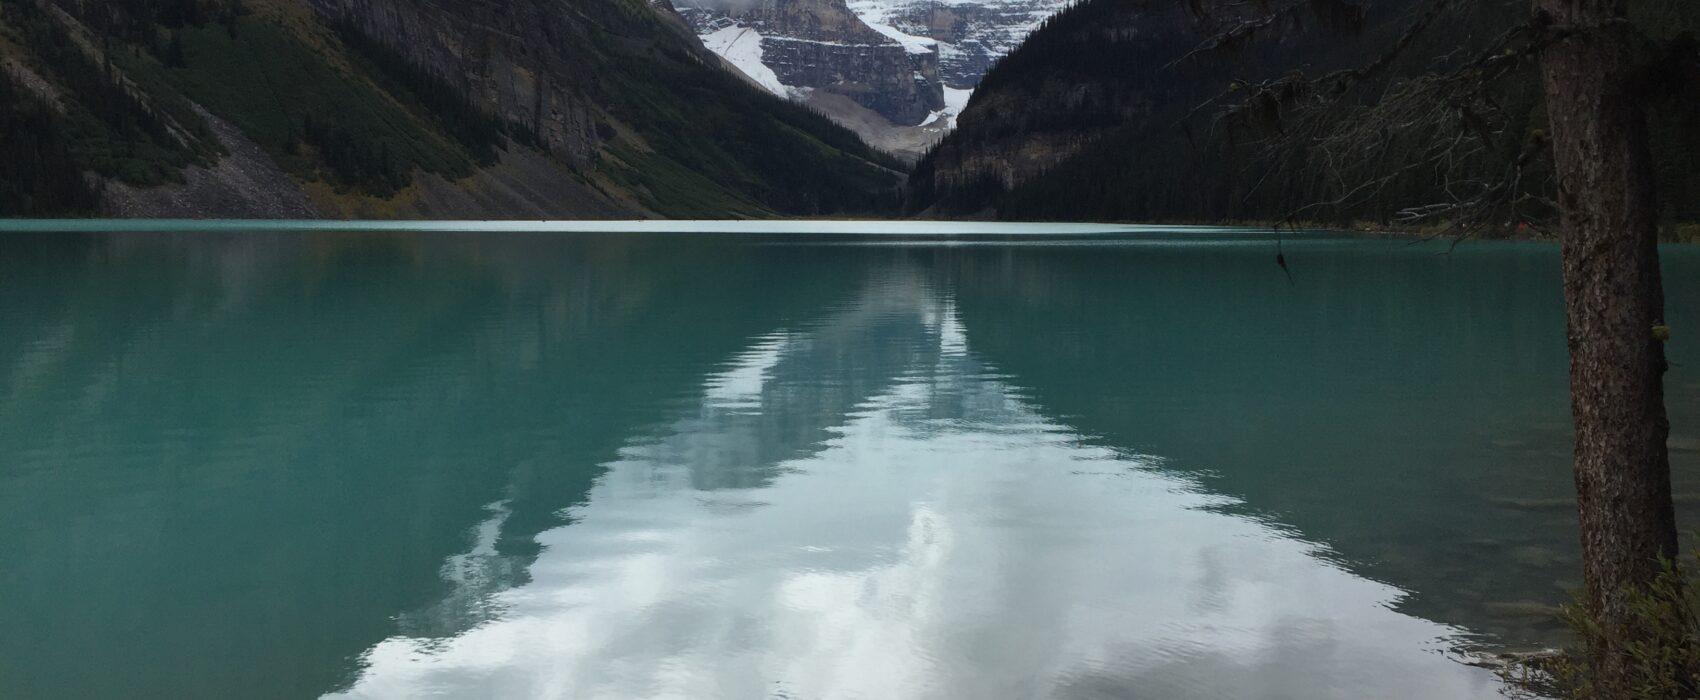 reflection in lake louise